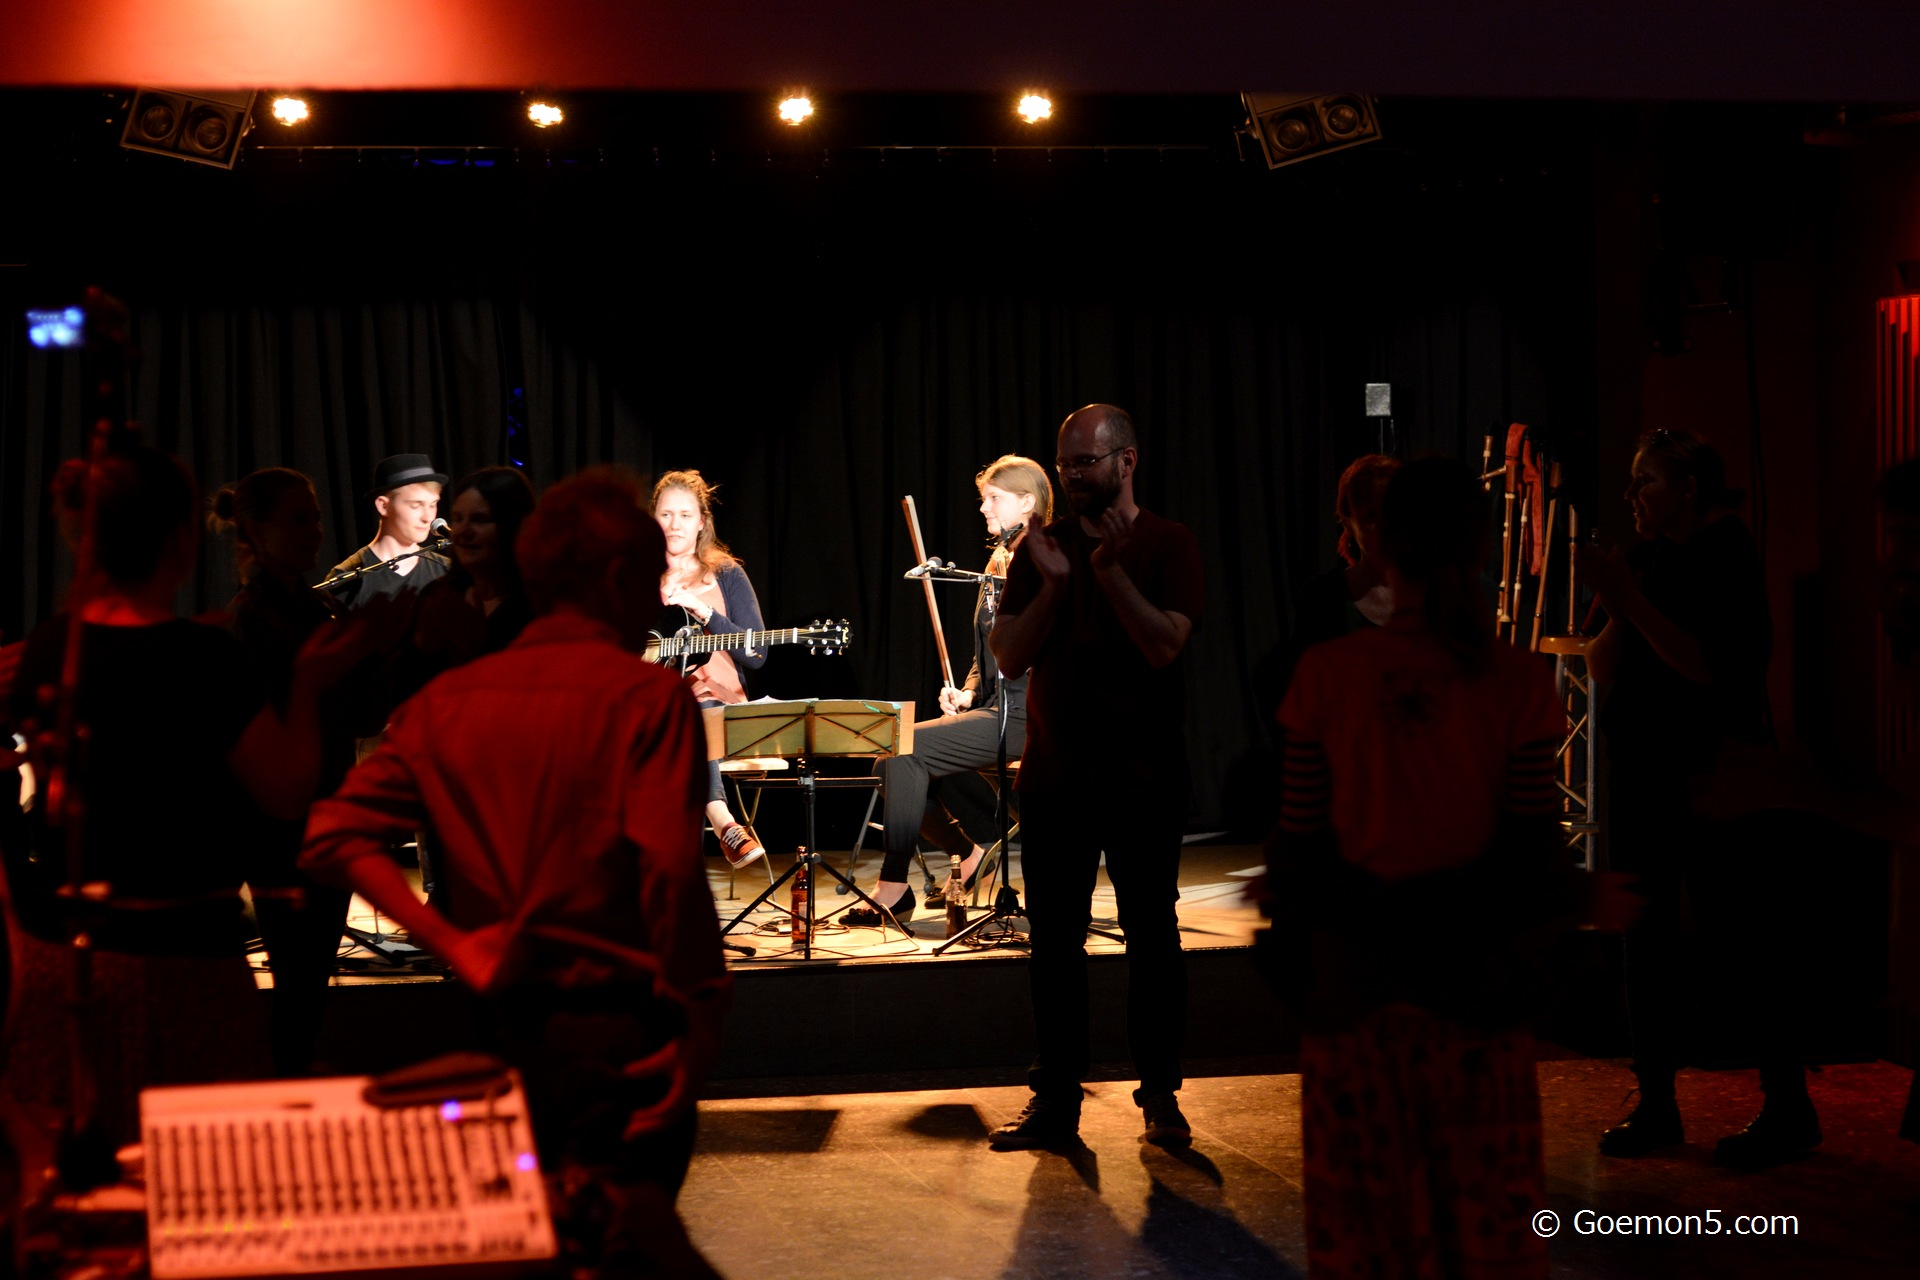 FolknWalde at Parkclub 2018 - HoPp 2